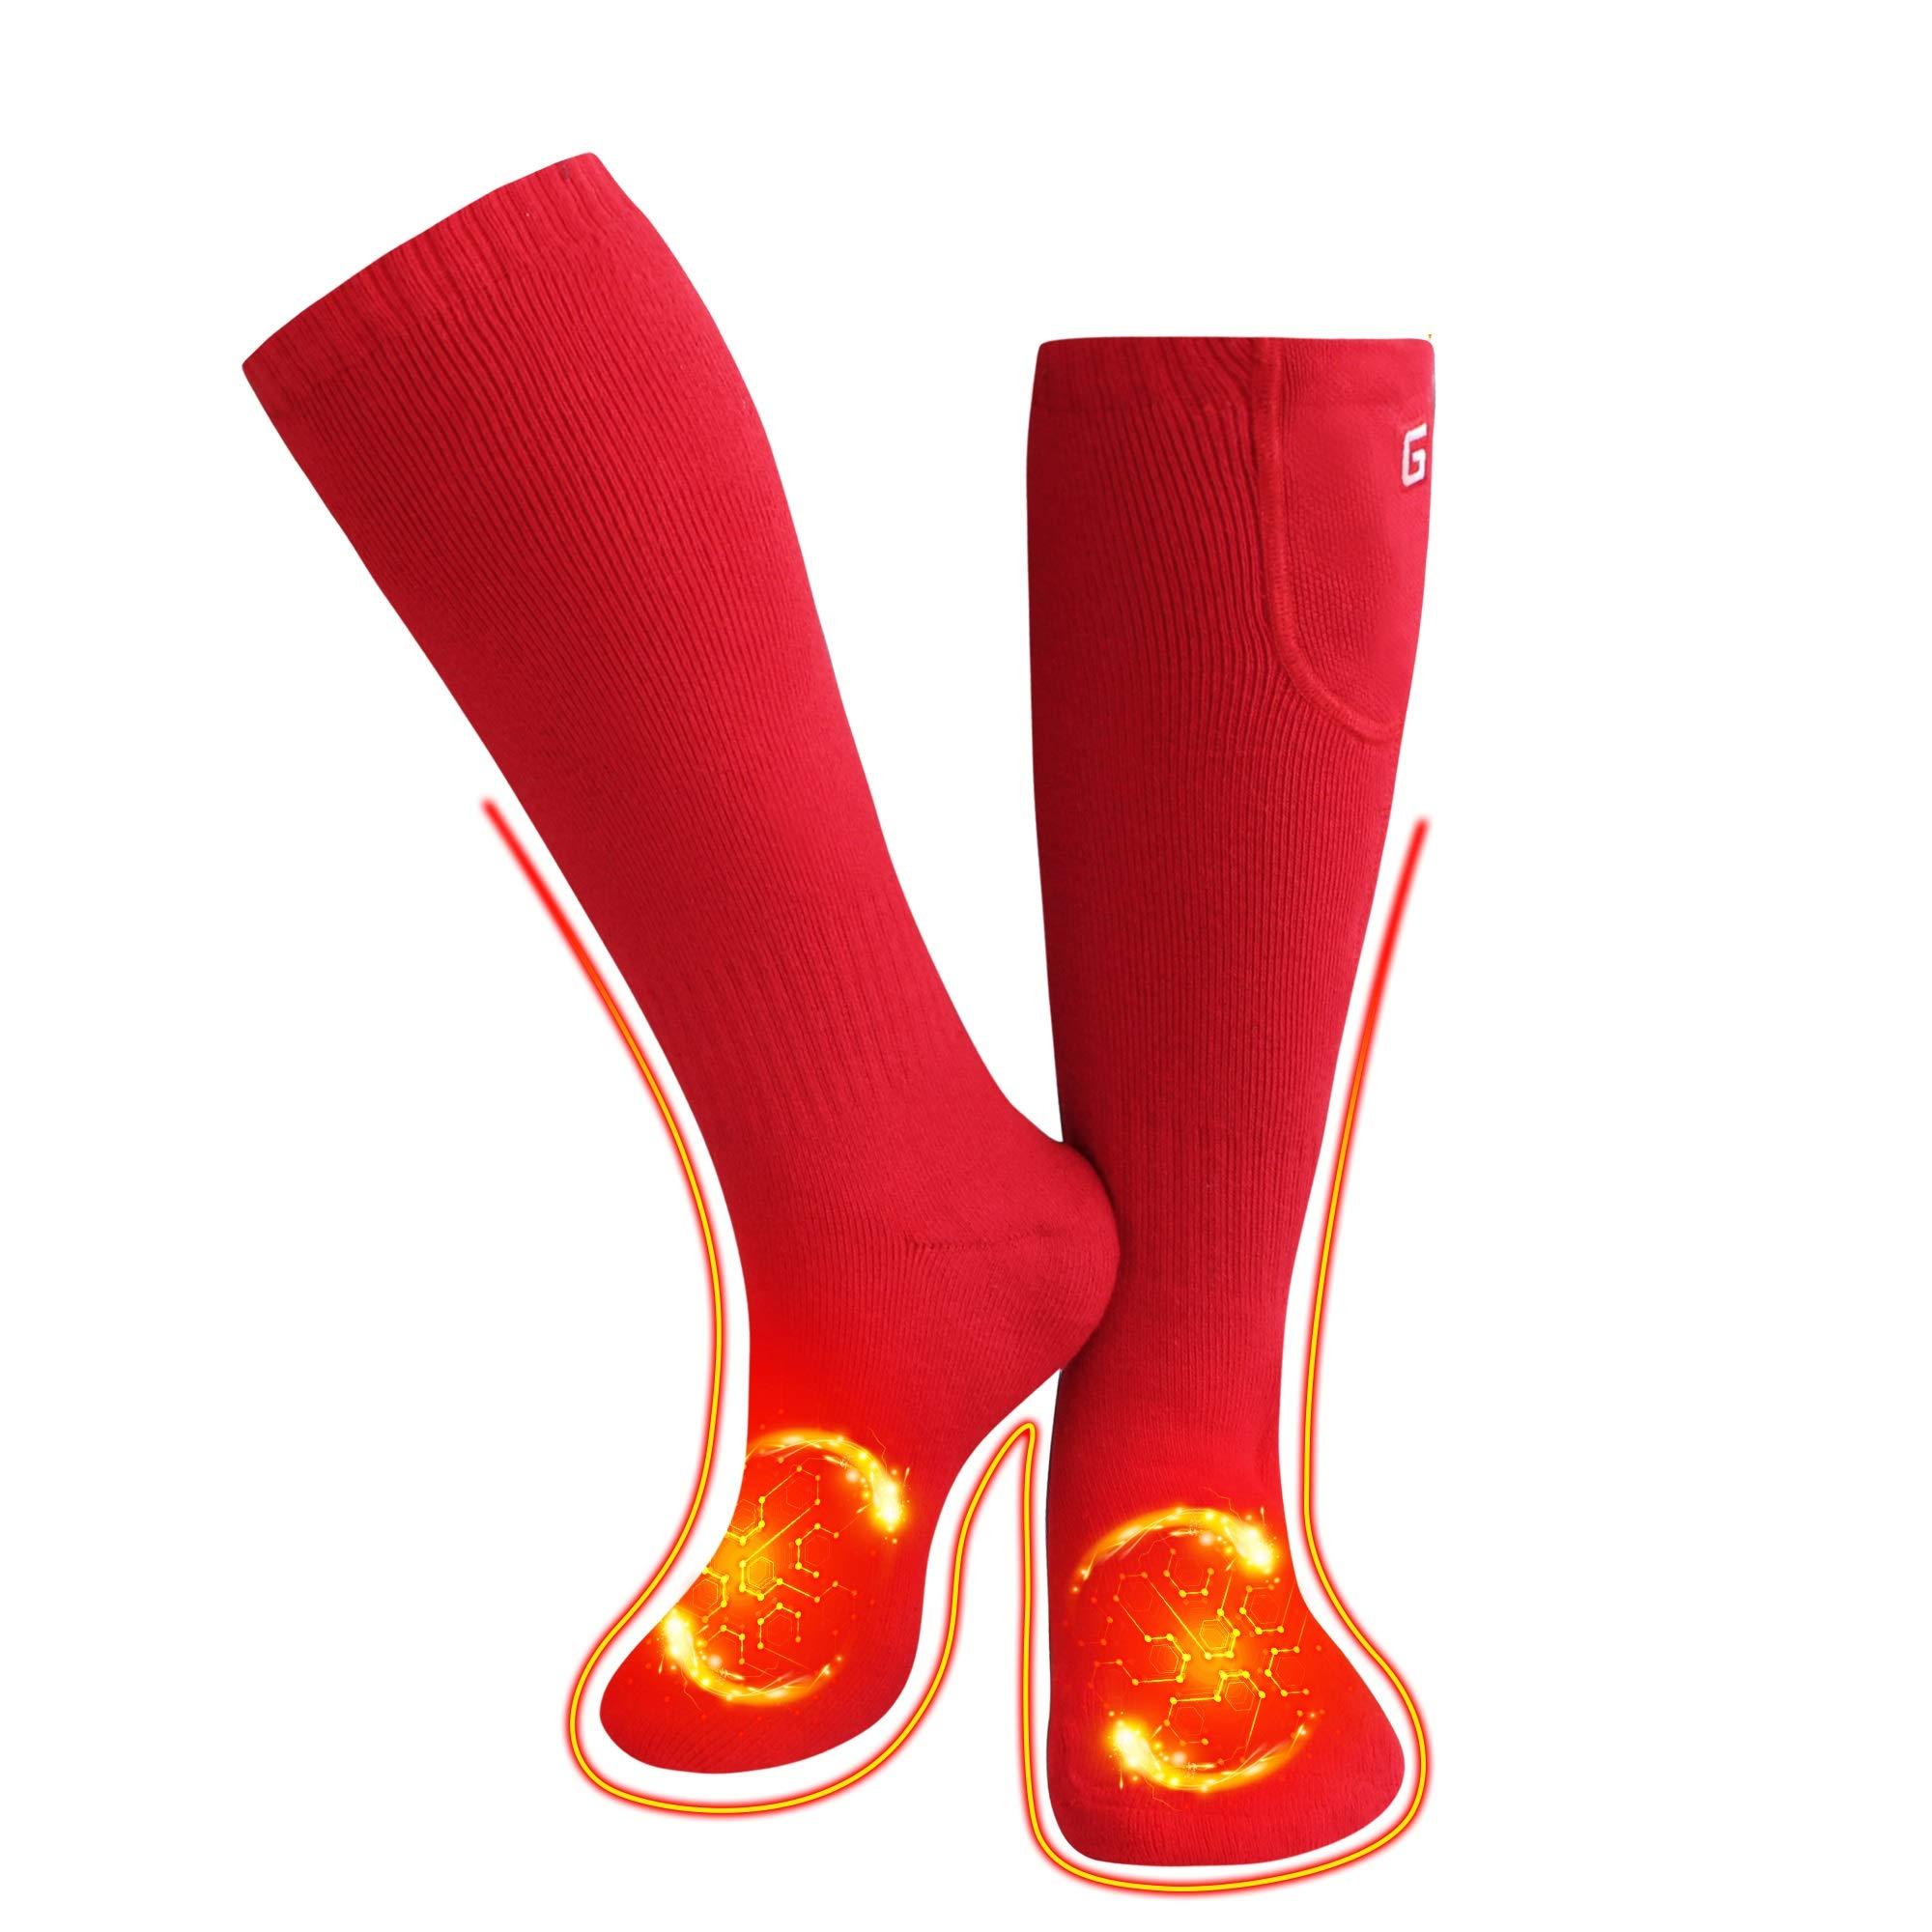 QILOVE Winter Warm Boot Socks Battery Heated Socks Rechargeable Men Women Christmas Red Hot Socks by QILOVE